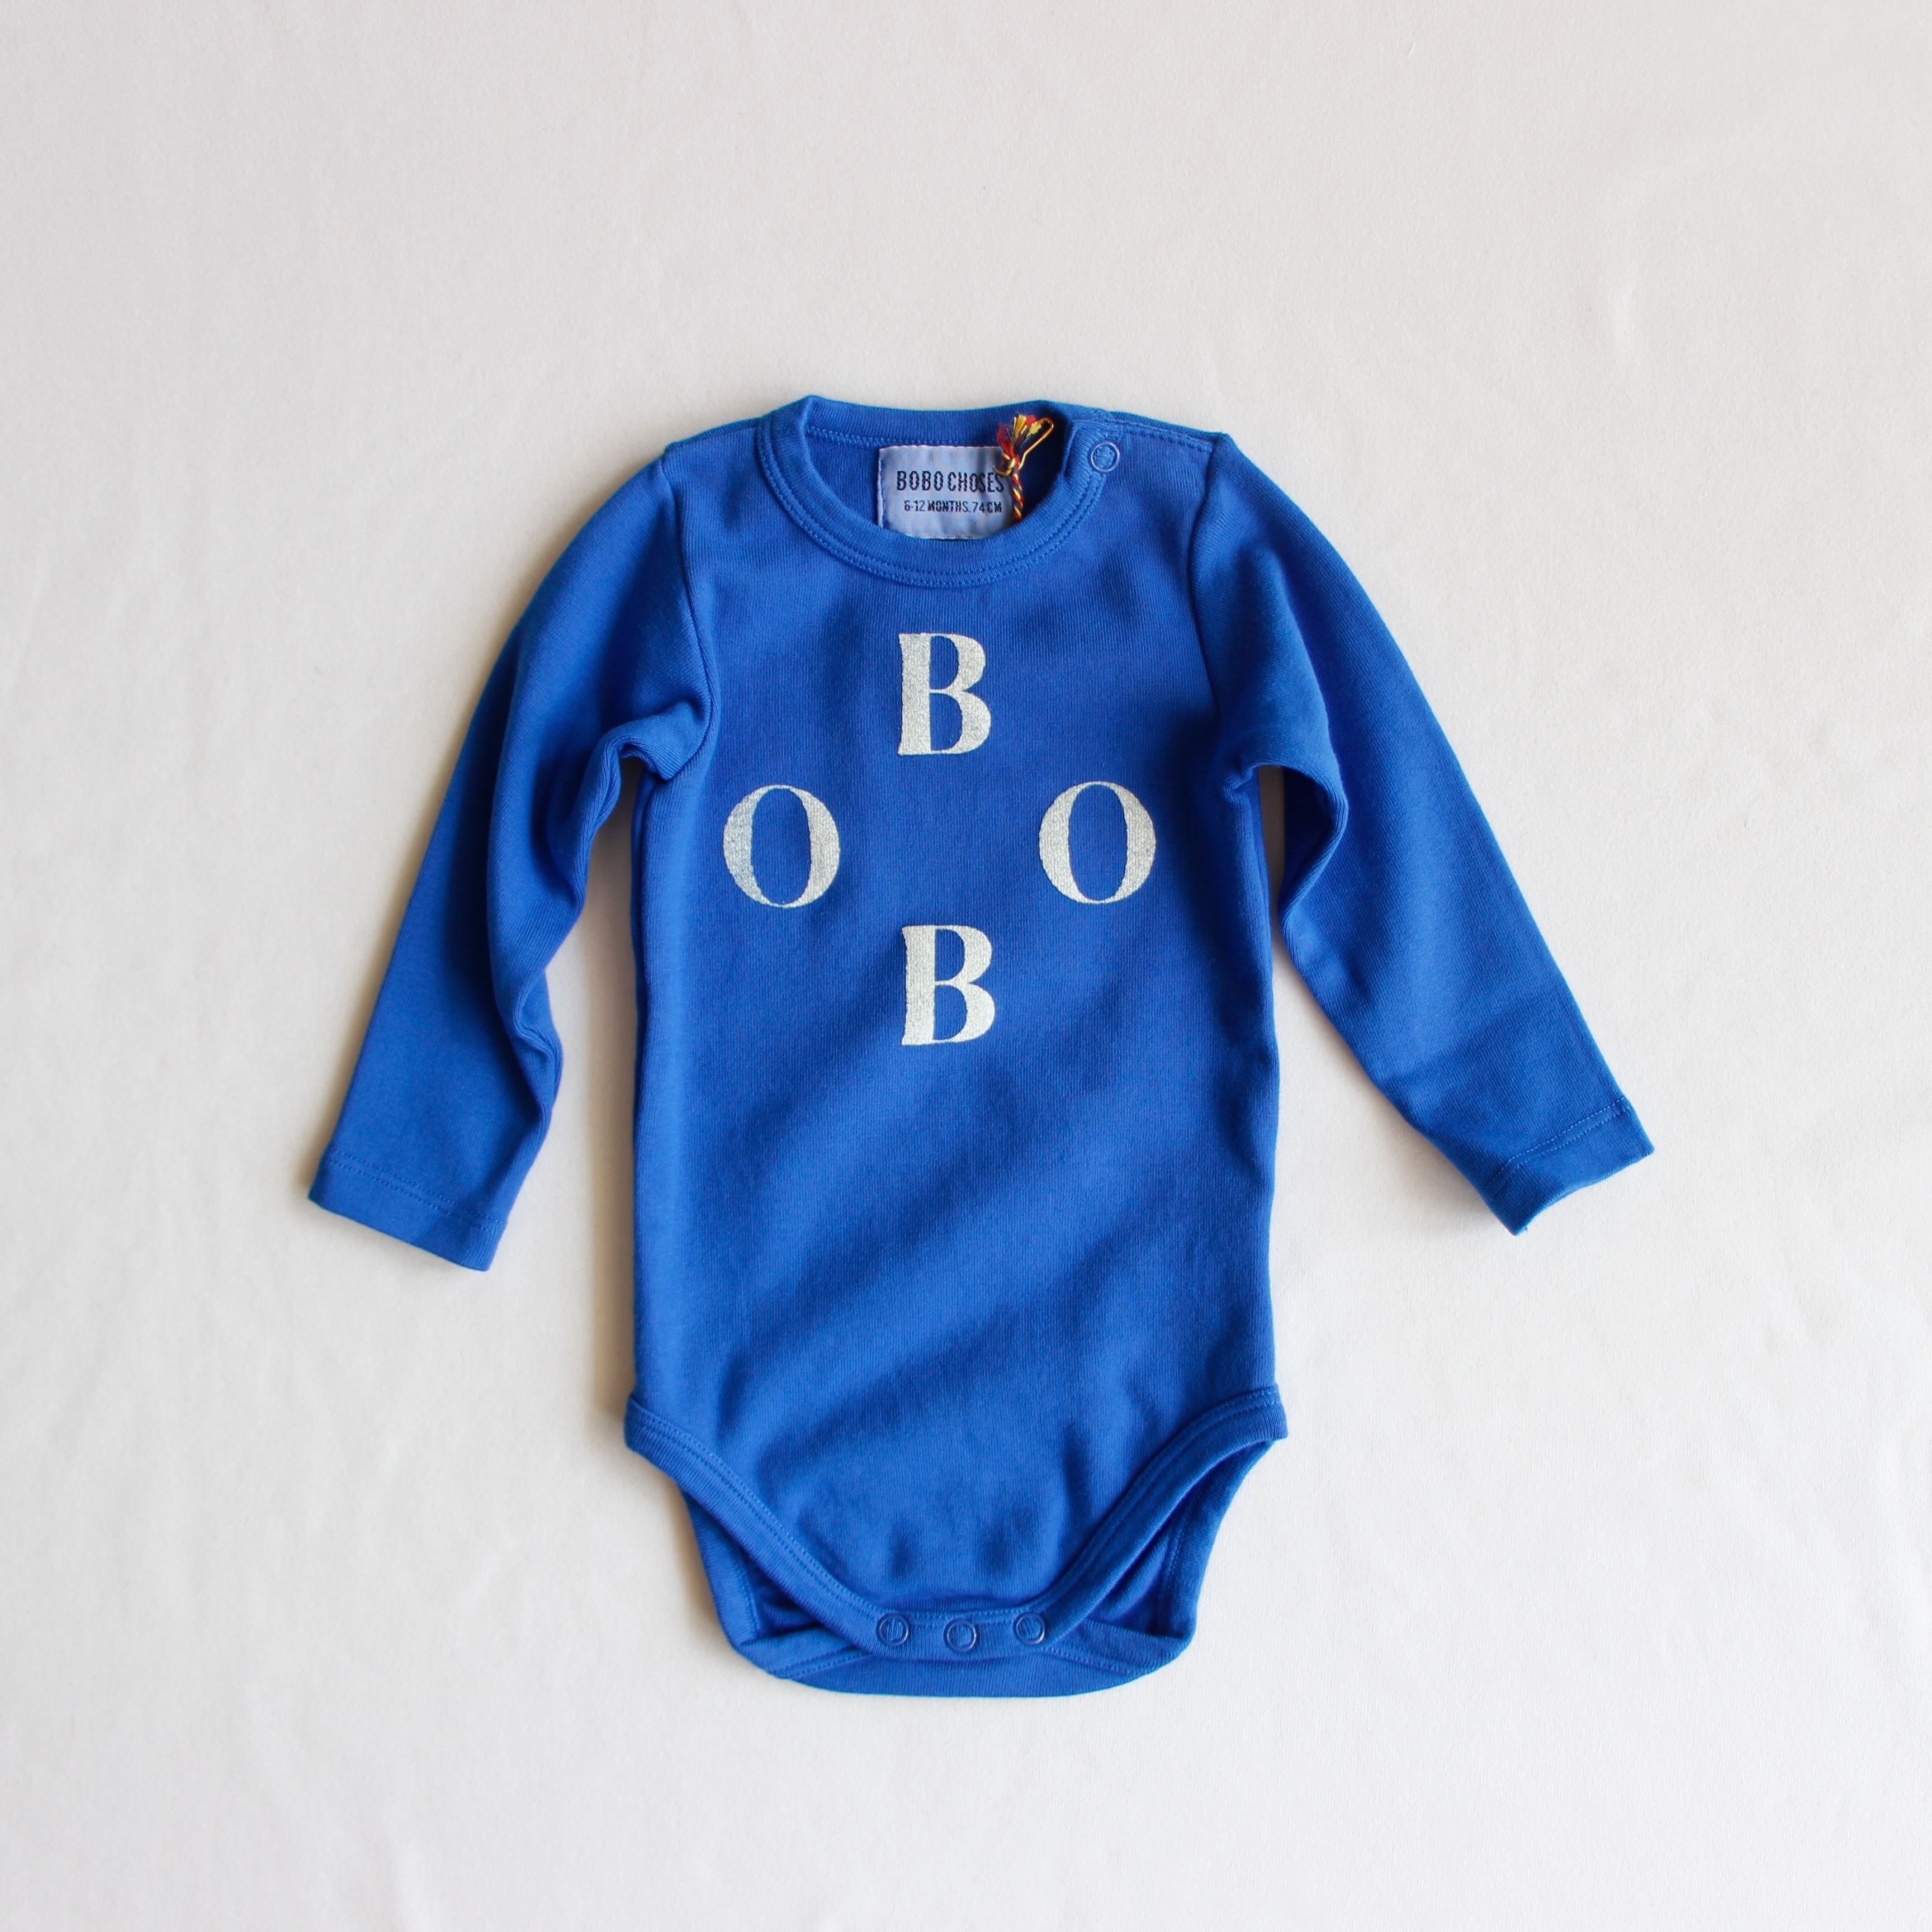 《BOBO CHOSES 2019AW》BOBO long sleeve body / 6-12・12-18M